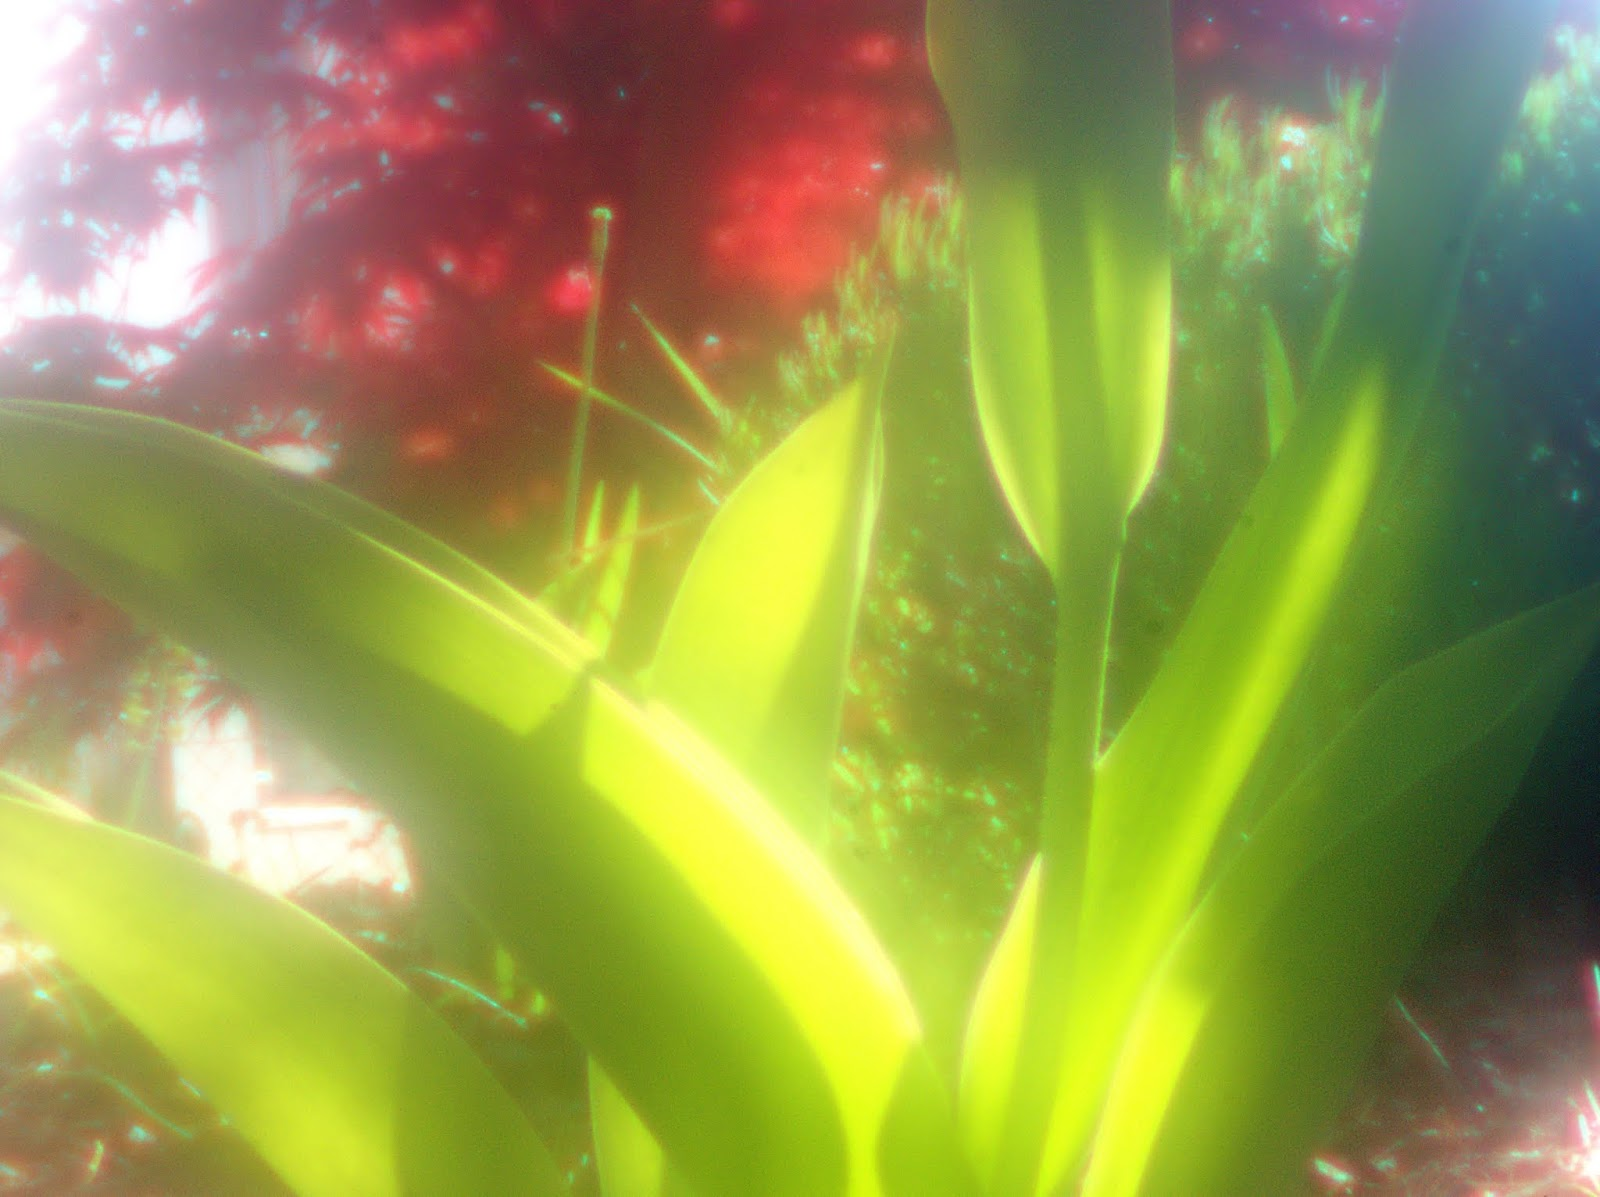 World Pinhole Photography Day 26.04.2020 - Mein Beitrag